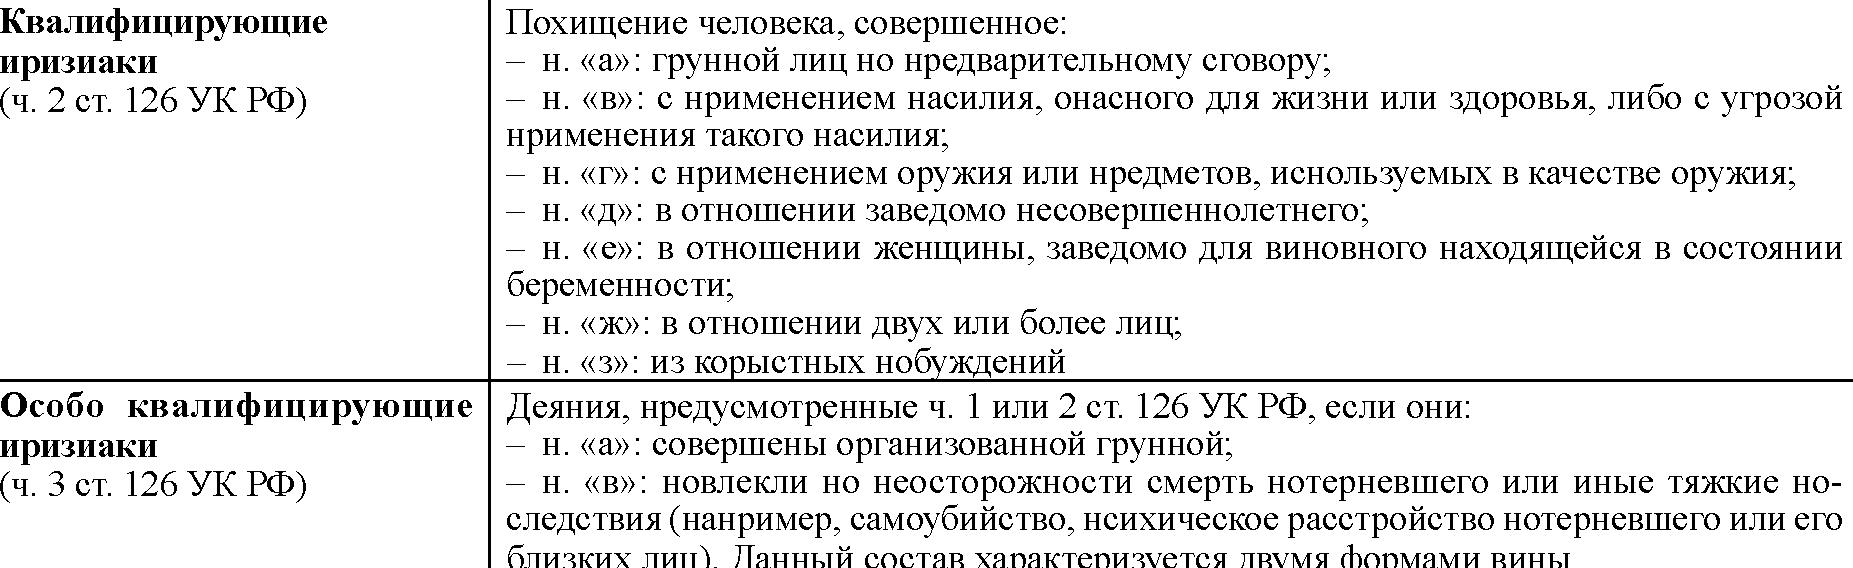 Статья 116 ук рф доклад 5177